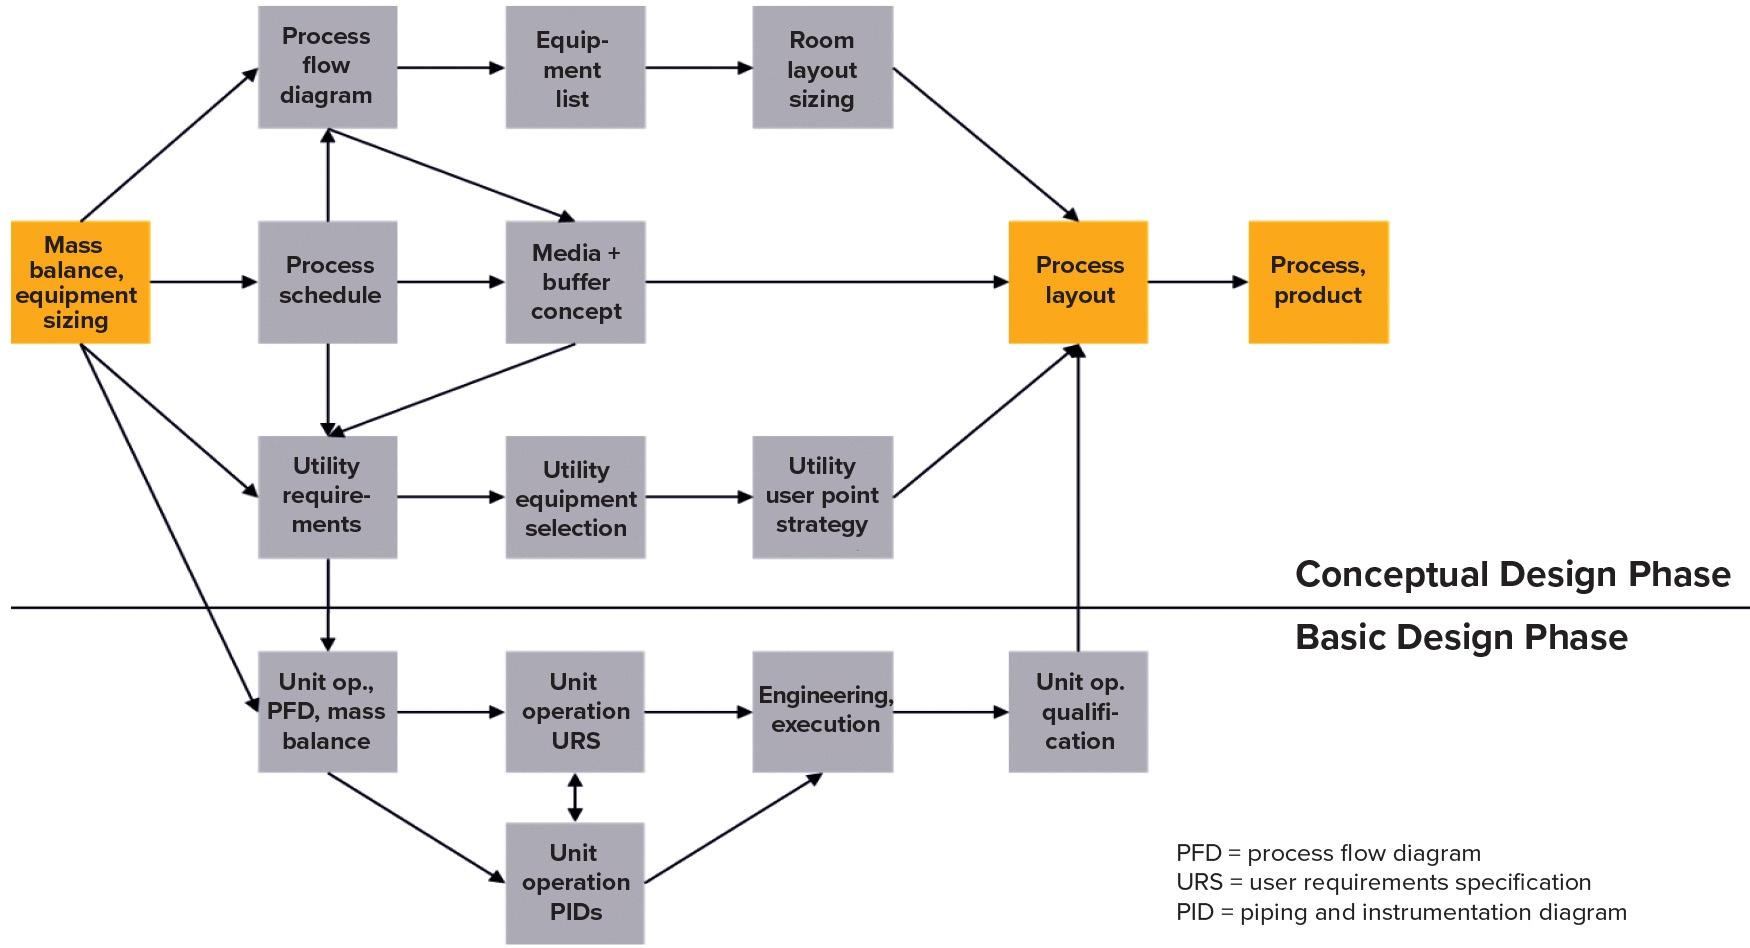 hight resolution of figure 1 mass balancing report mbr as the basis of engineering tasks at sartorius stedim biotech